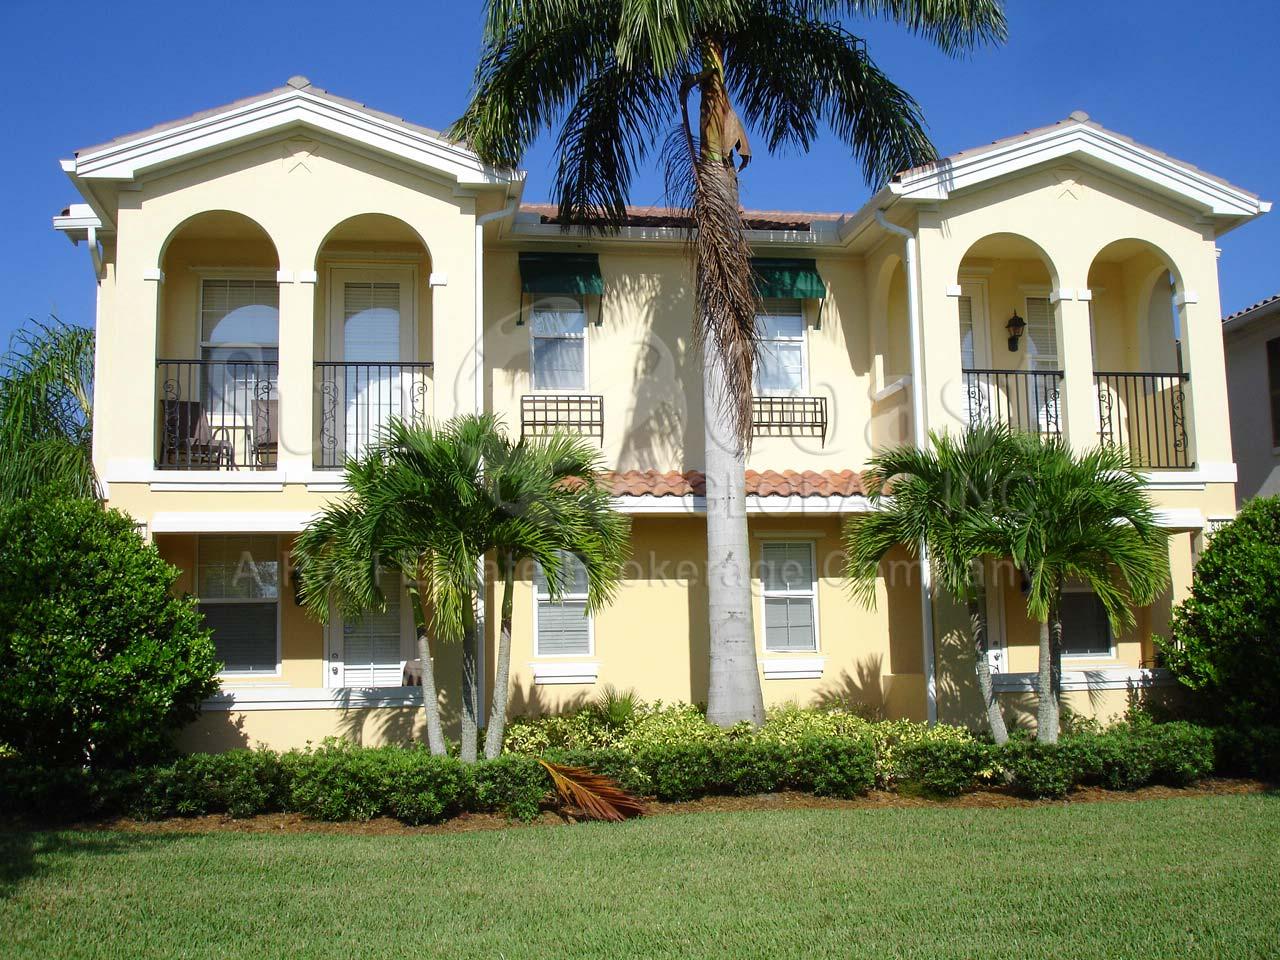 TOWNHOMES at VERONA WALK Real Estate Naples Florida Fla Fl